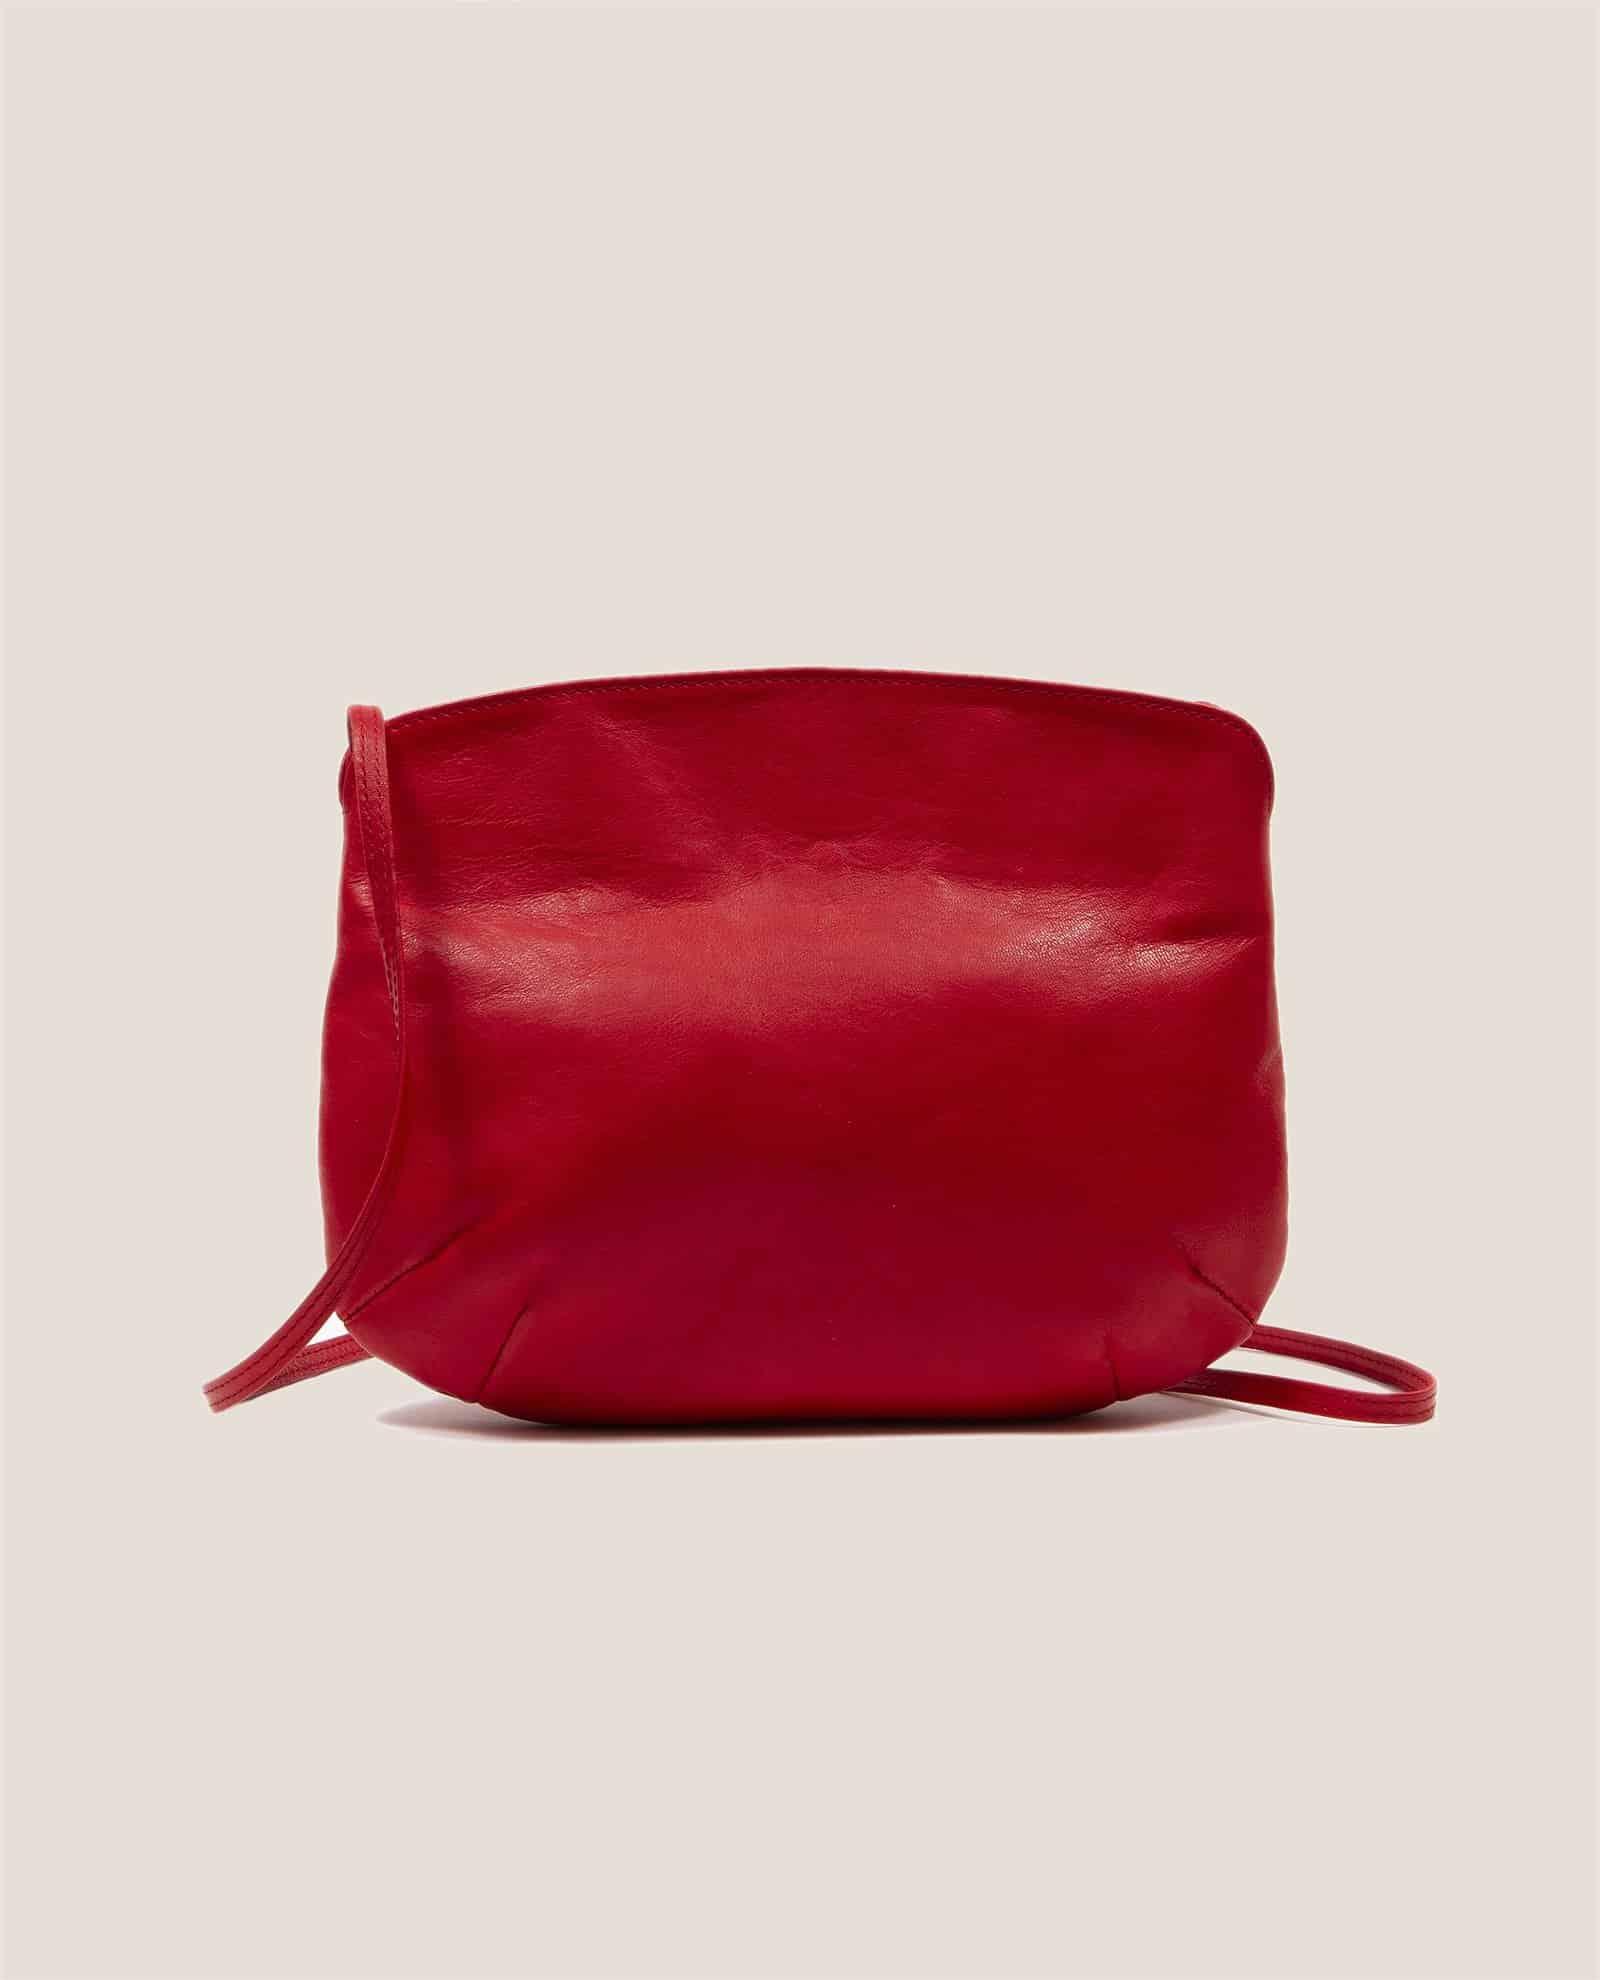 Cross Body Bag, Debbie Red (ref #DPR-30) Petty Things - back